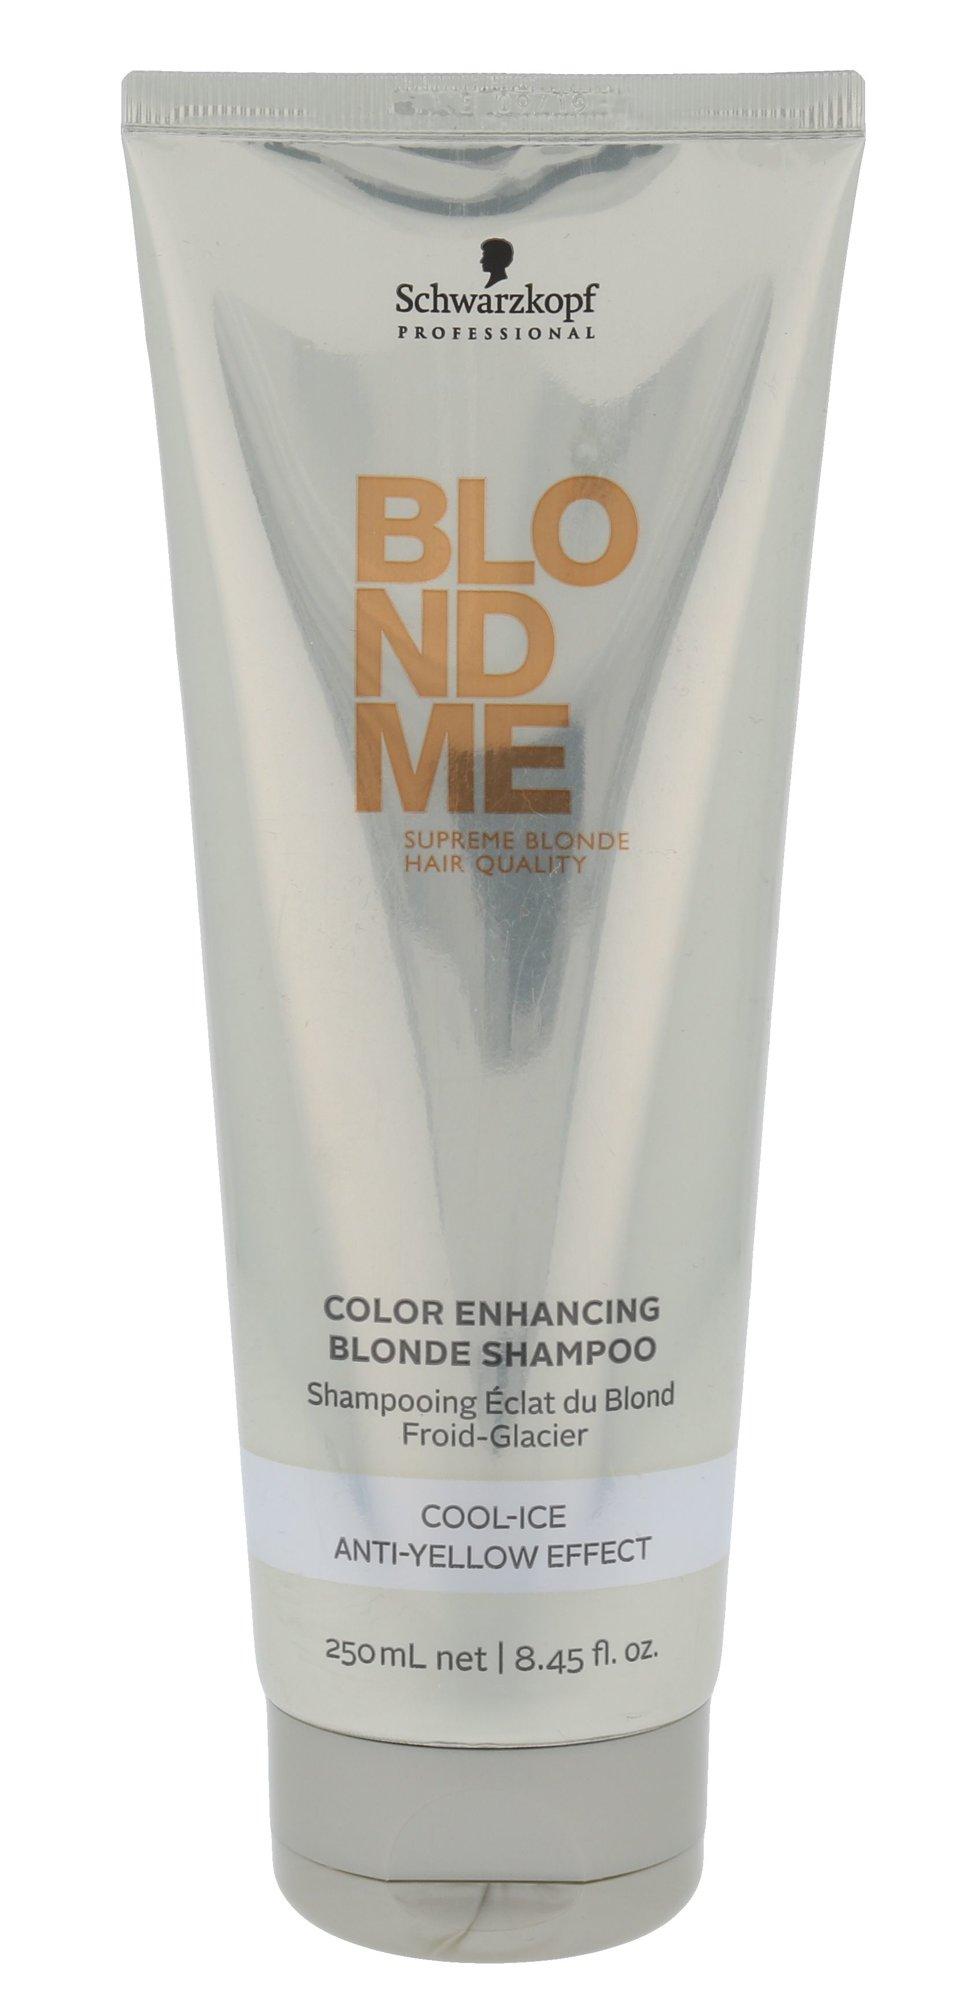 Schwarzkopf Blond Me Cosmetic 250ml